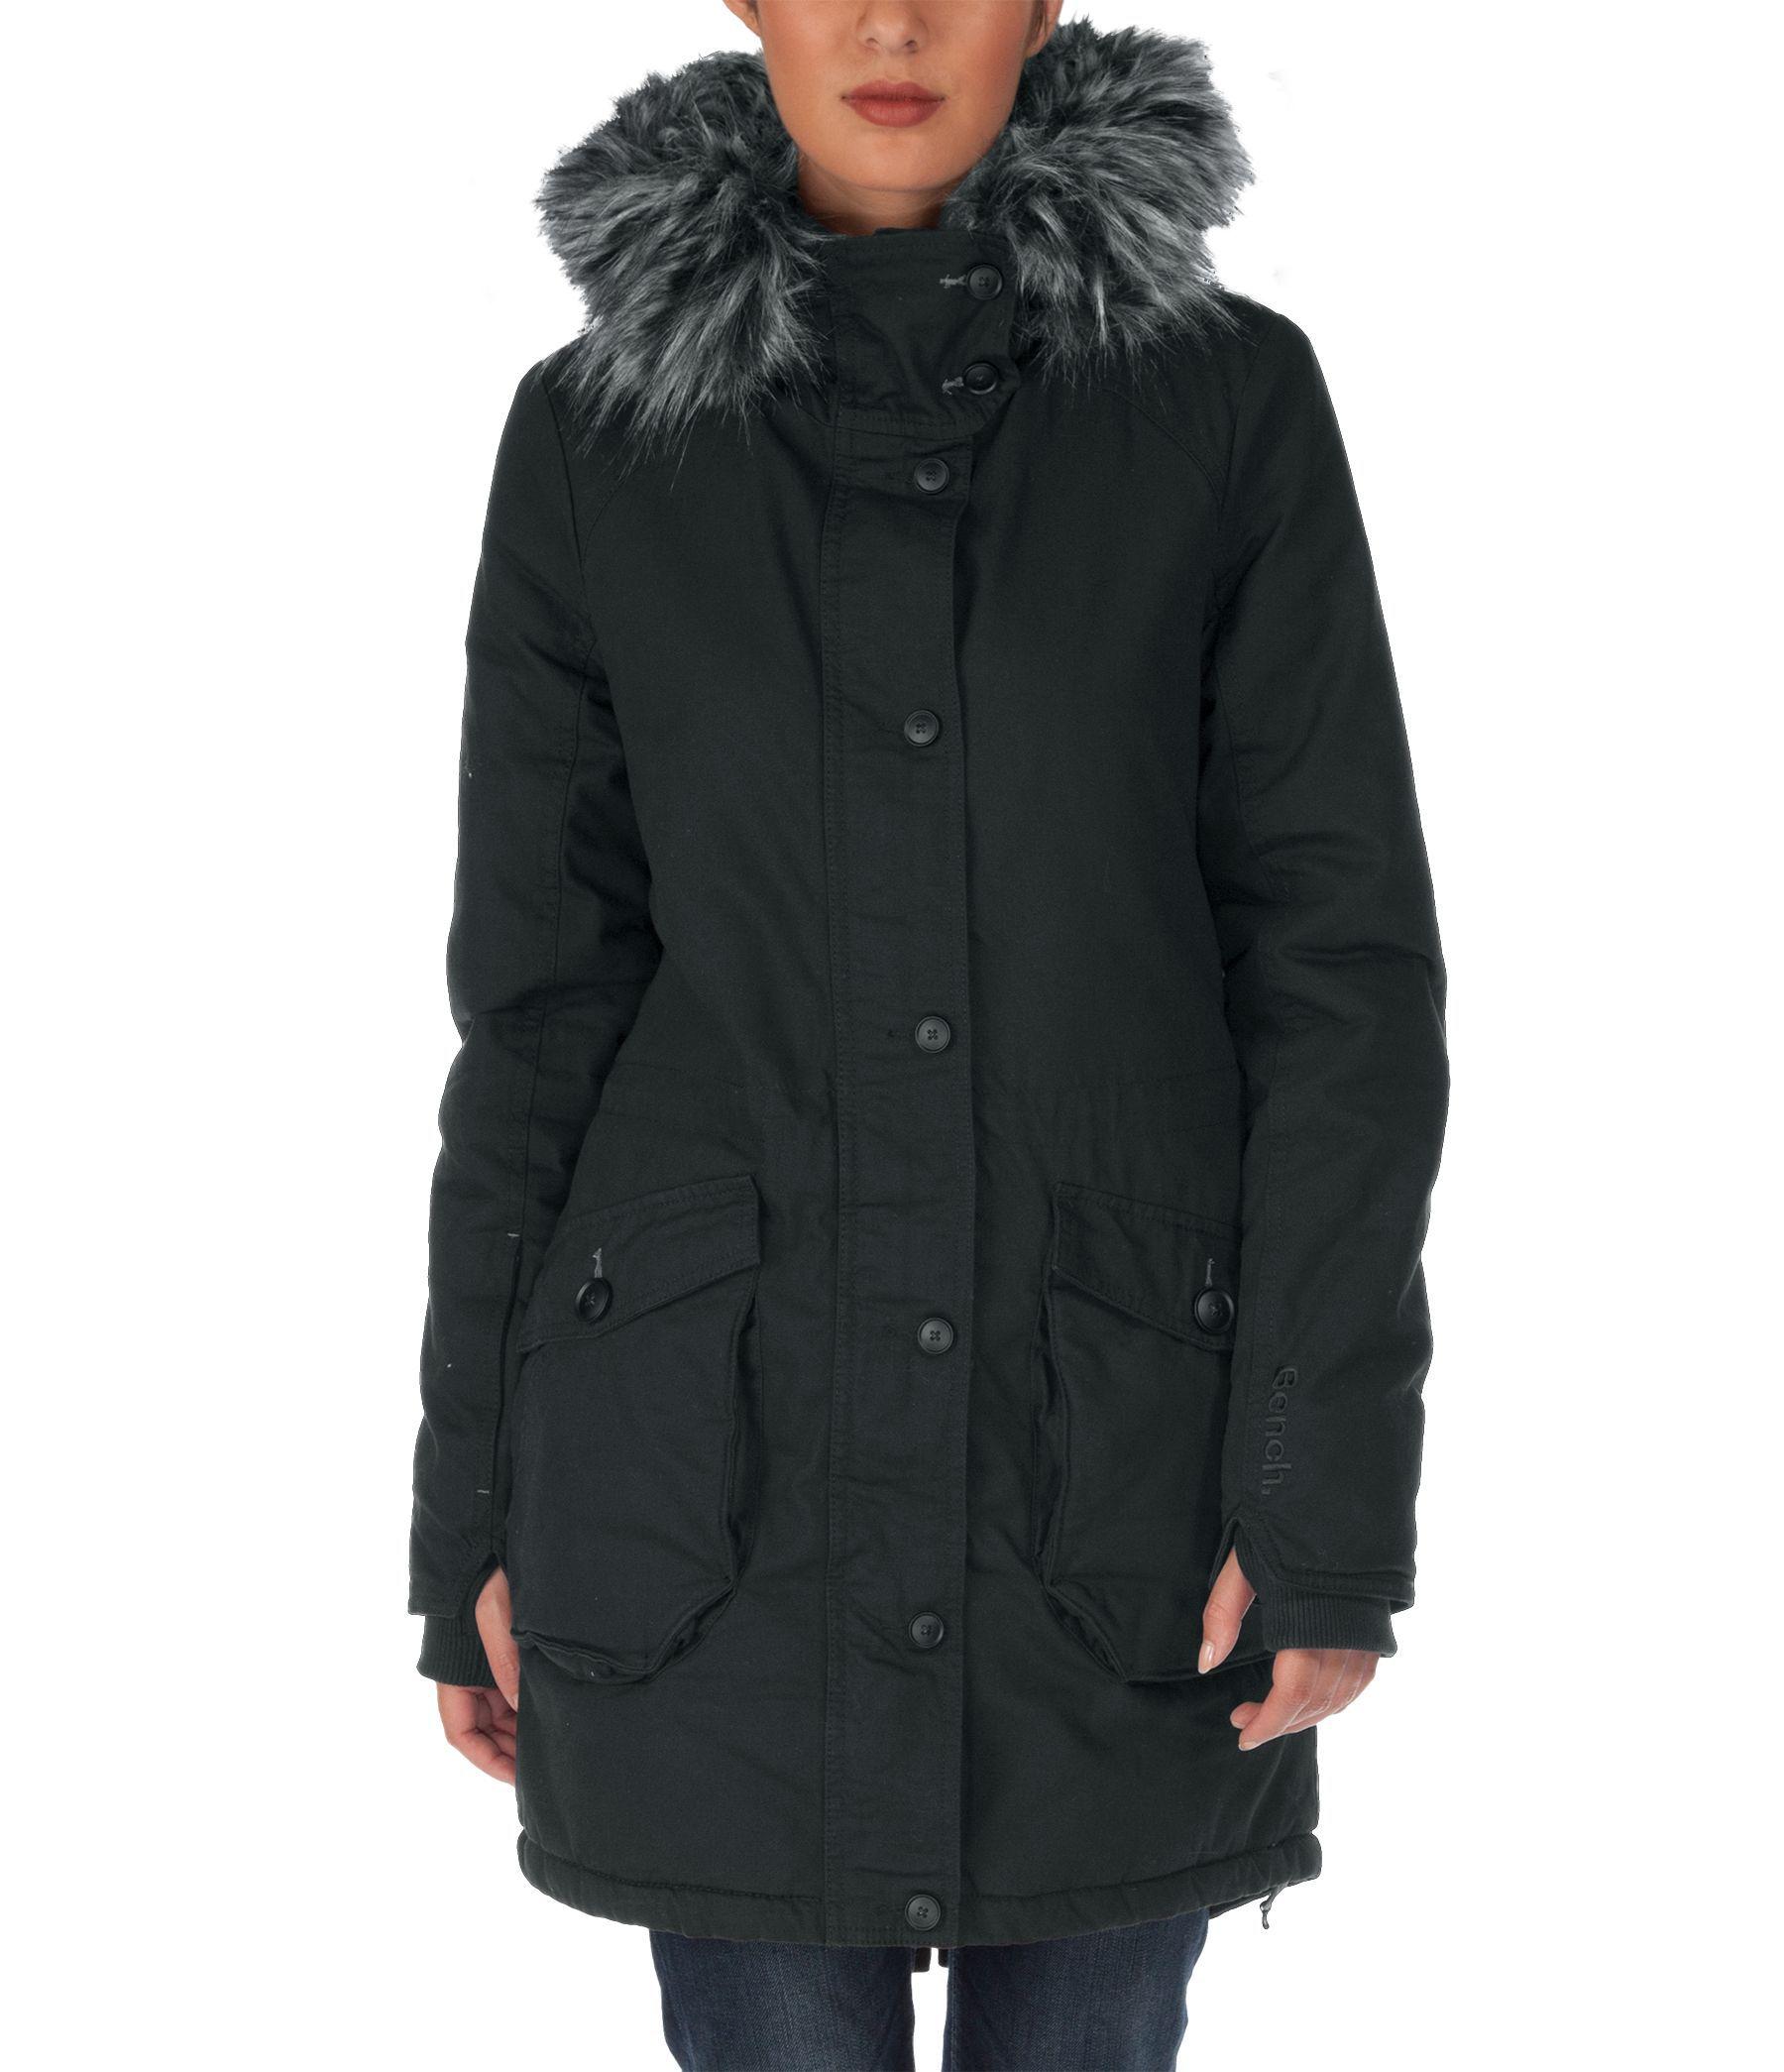 Bench wolfish jacket in black lyst Bench jacket